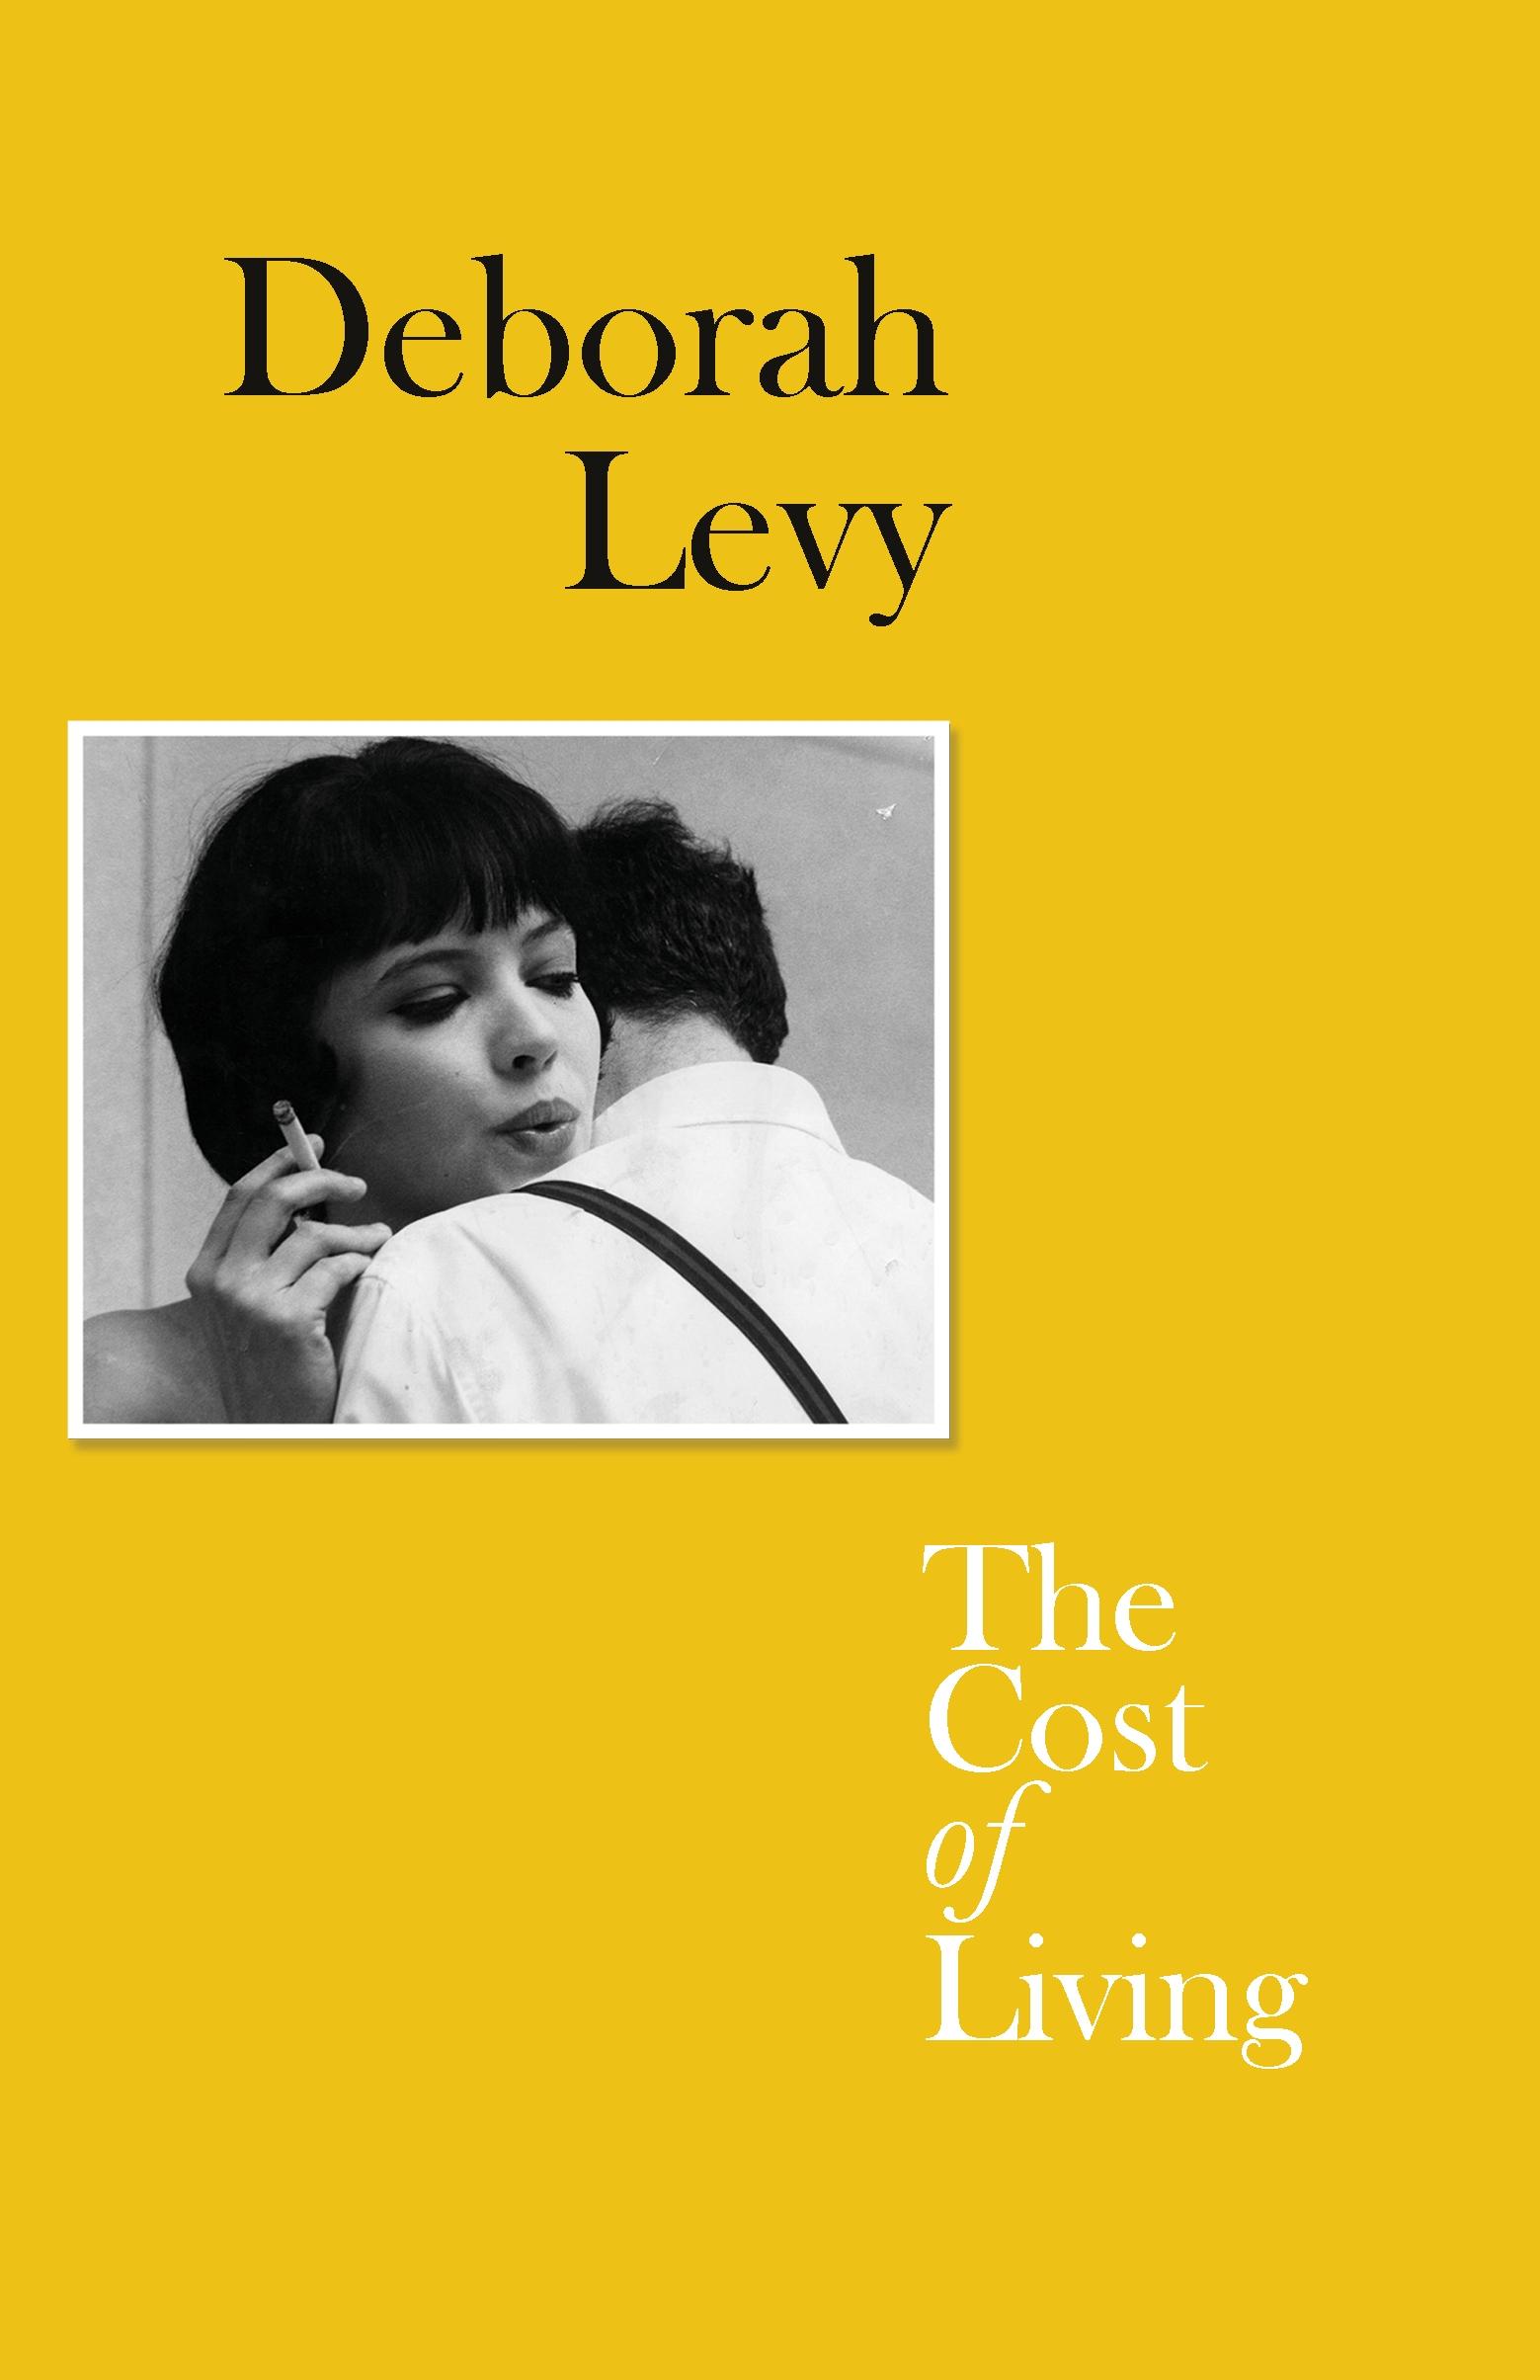 Deborah Levy, The Cost of Living, 2018. Courtesy Hamish Hamilton